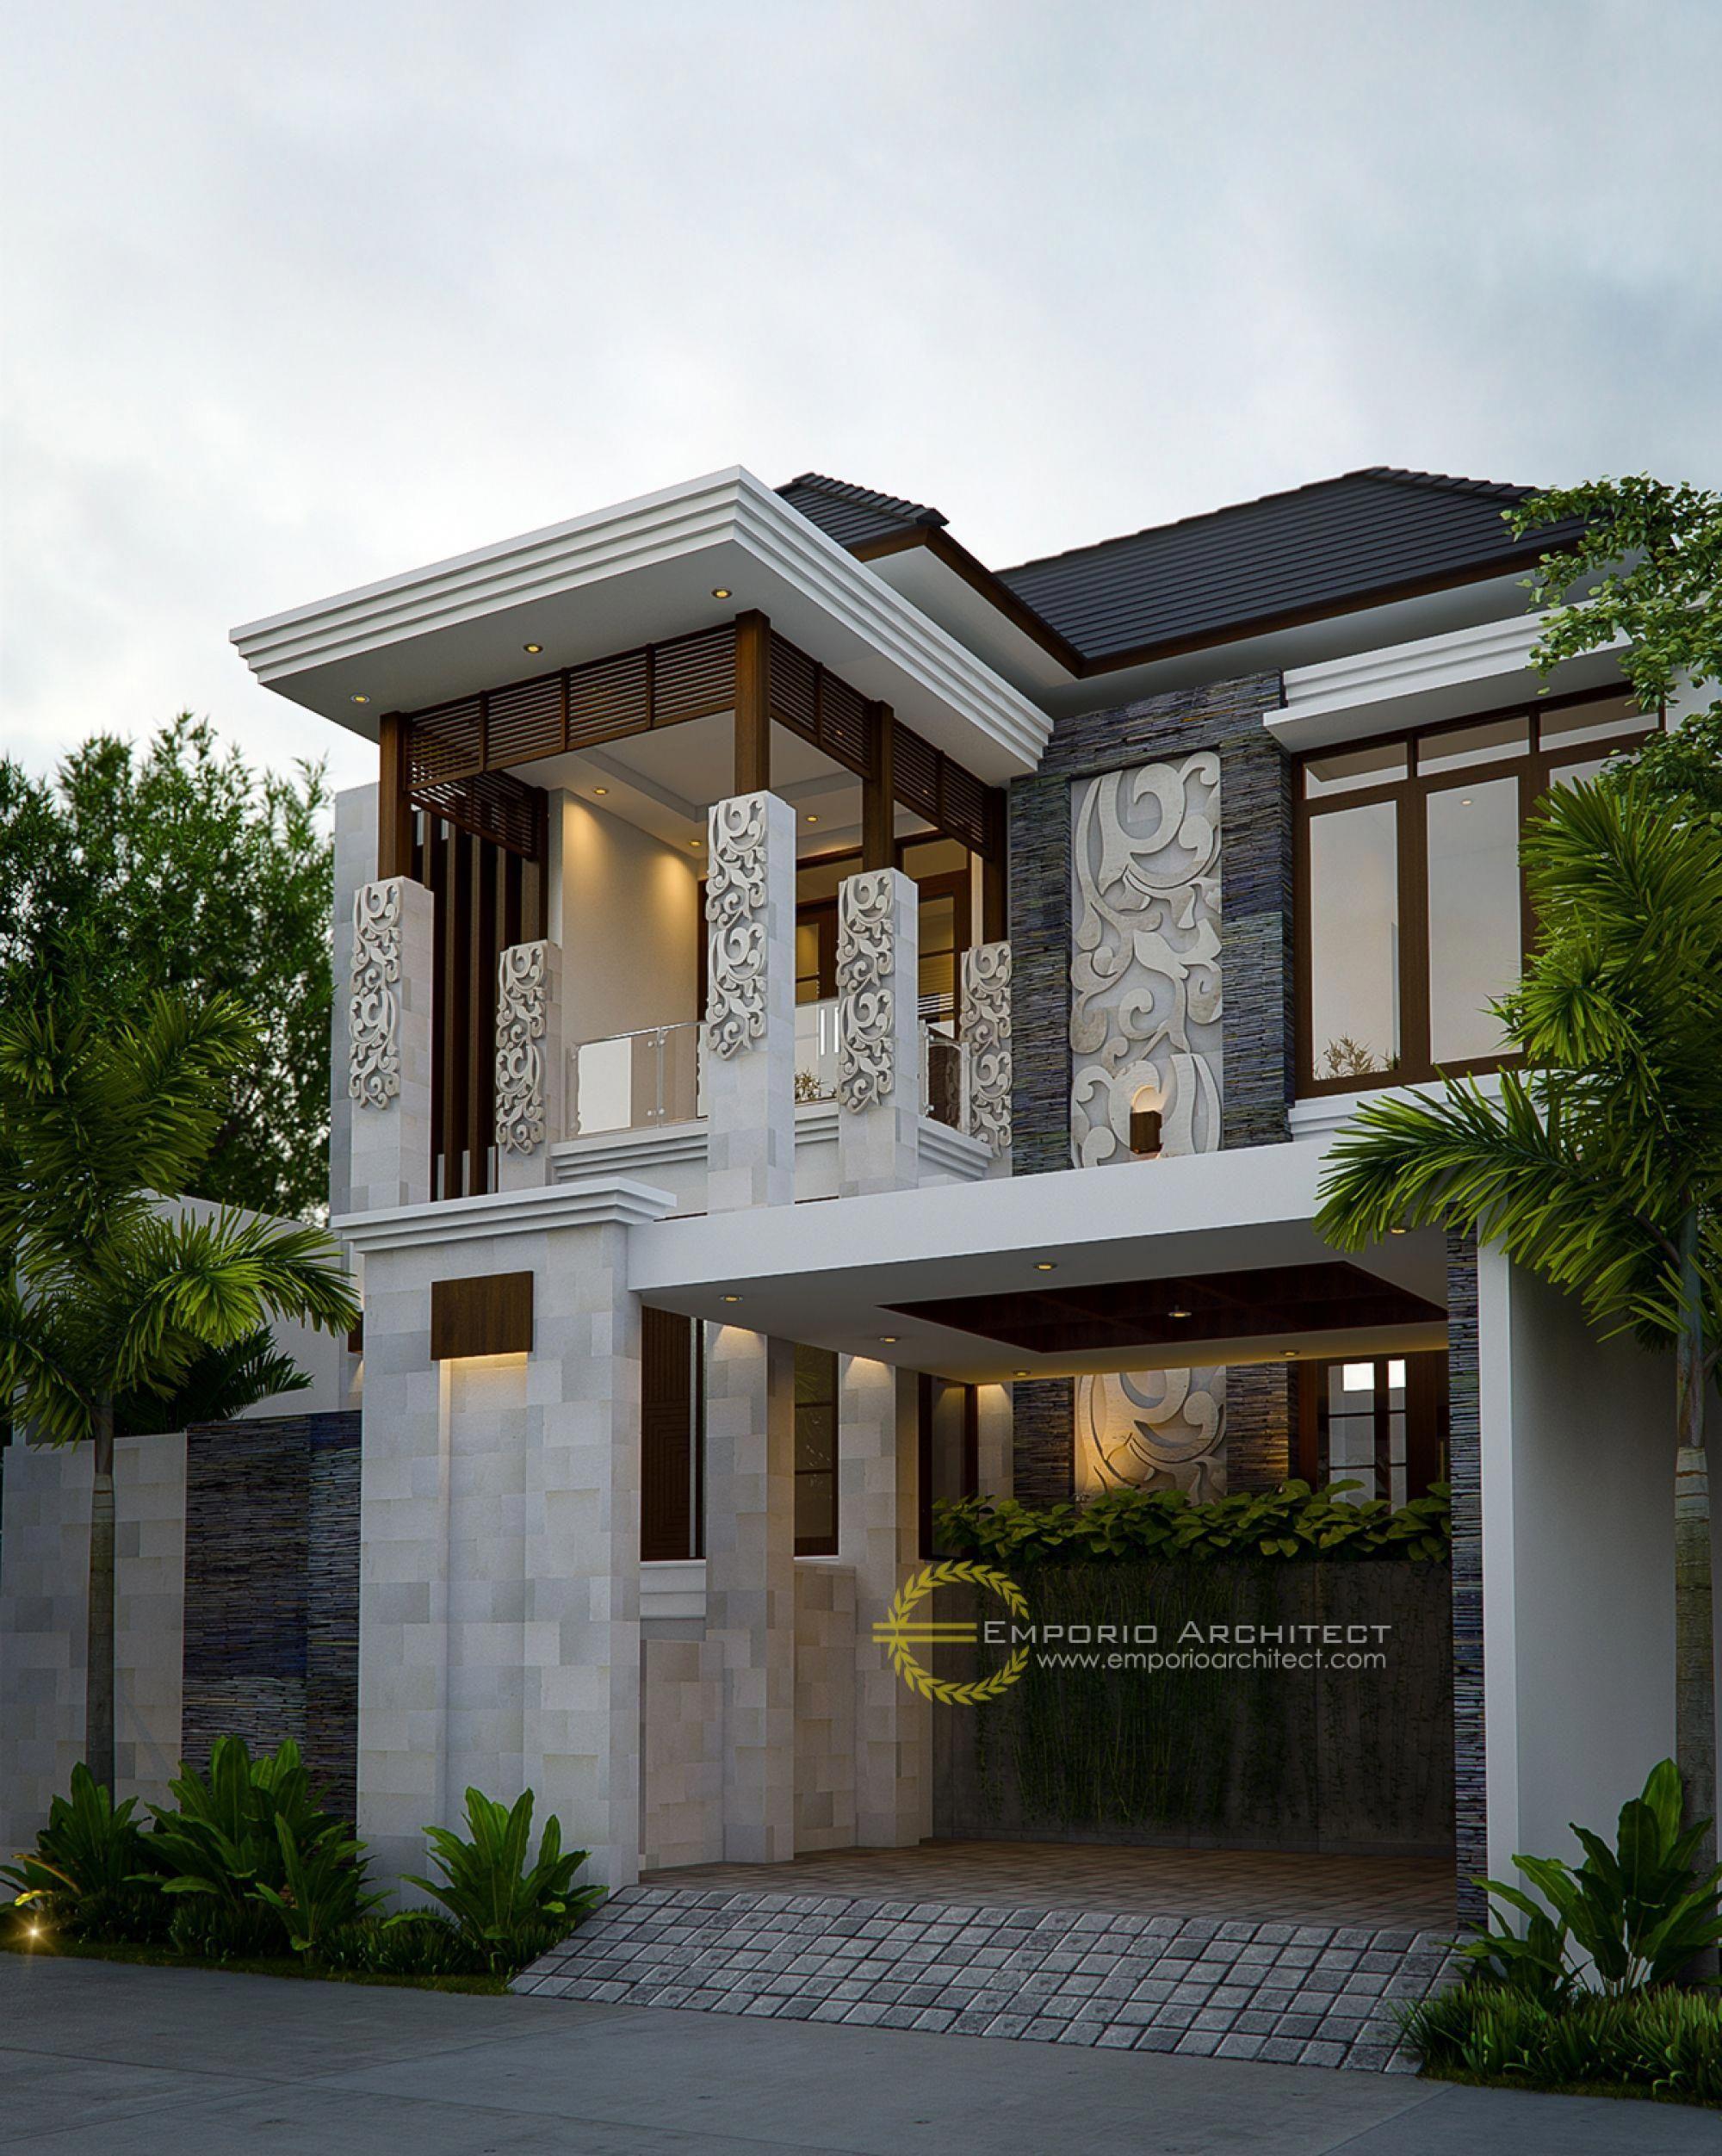 1 464 Small Modern Exterior Home Design Ideas Remodel Pictures: Modern Railing Balcony Design For Home #Modernhomedesign